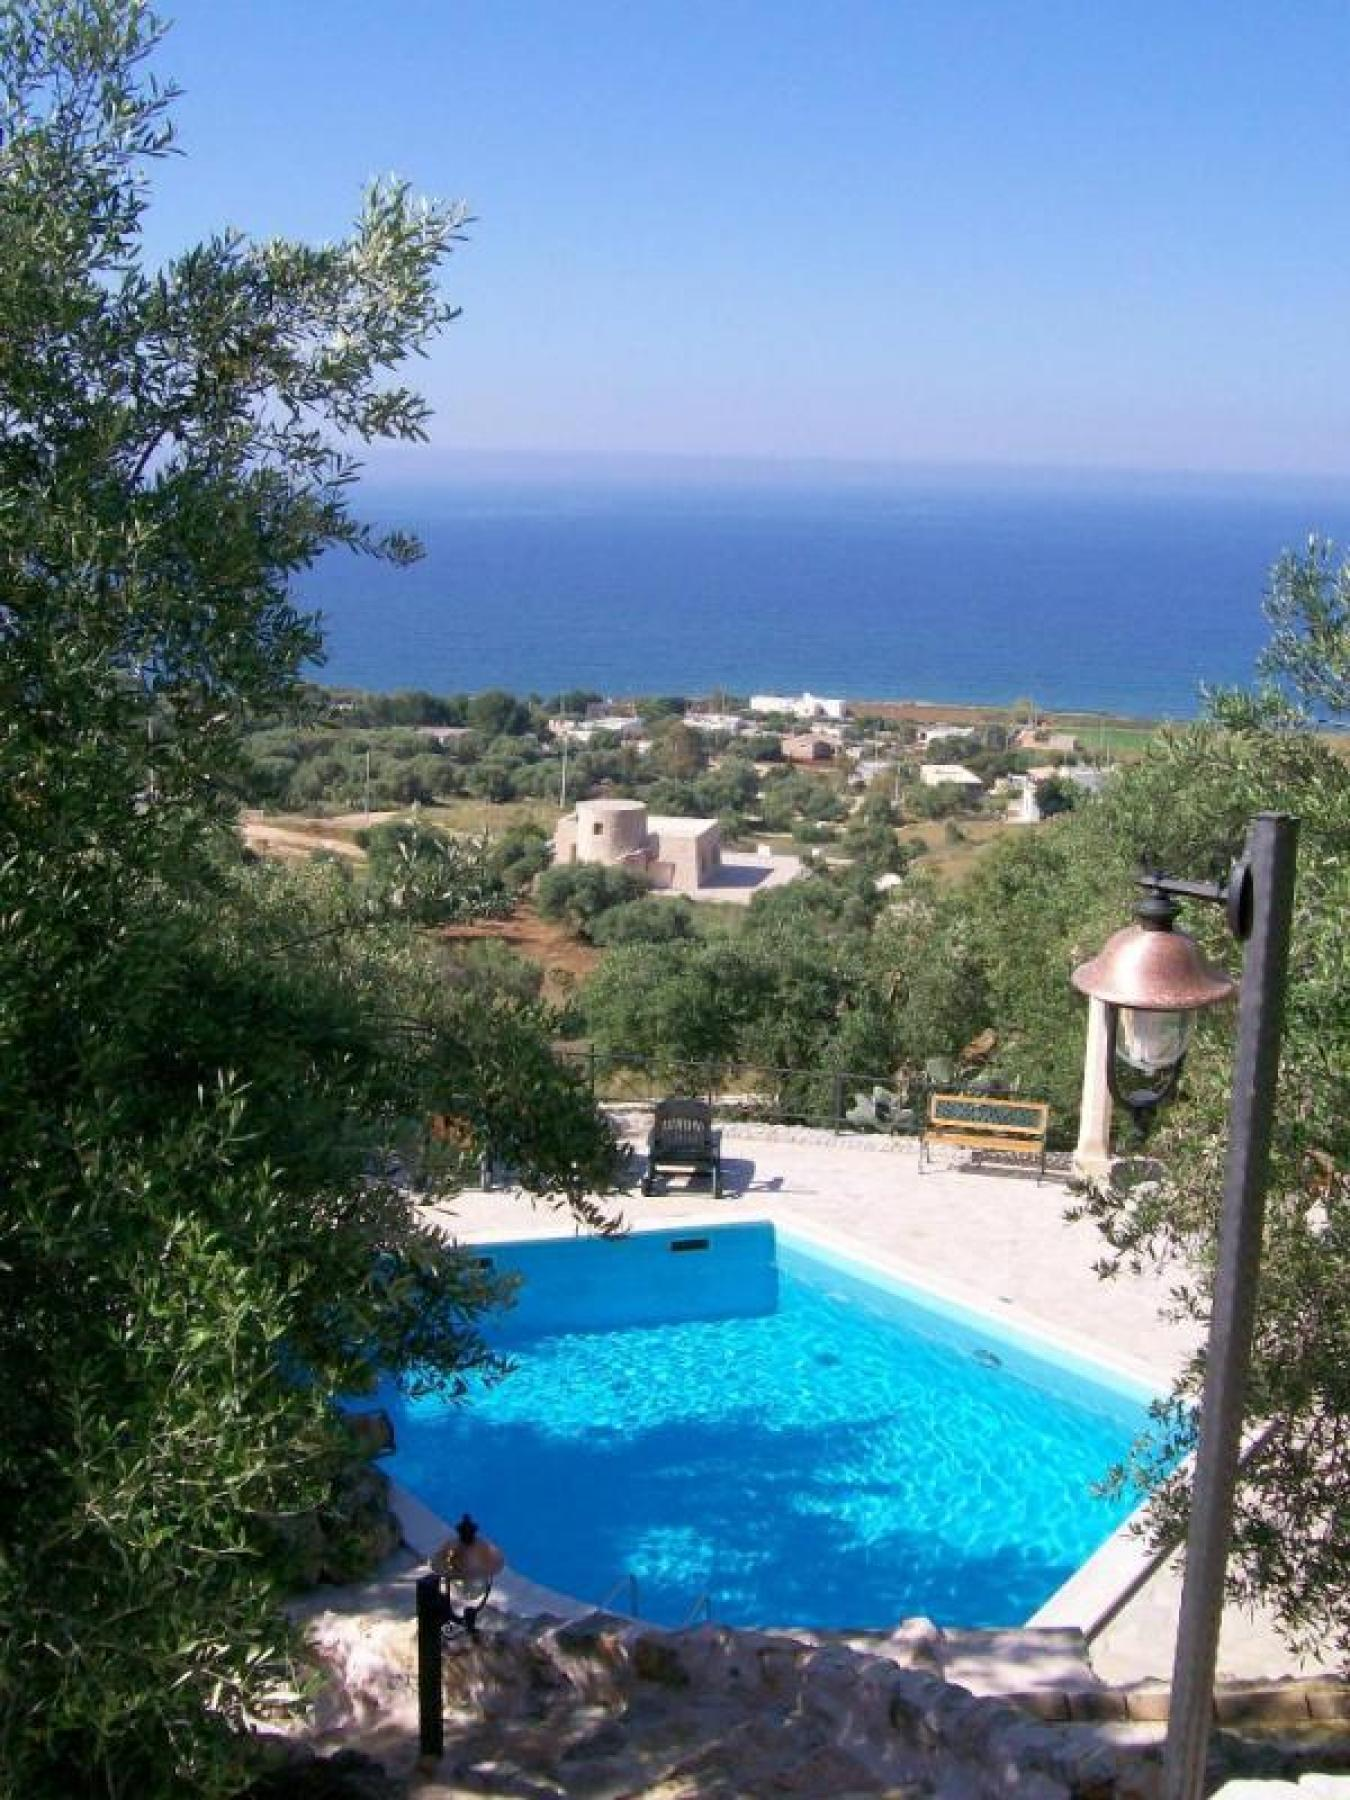 Villa nepole a torre vado villa con piscina n affitto per - Villa con piscina salento ...